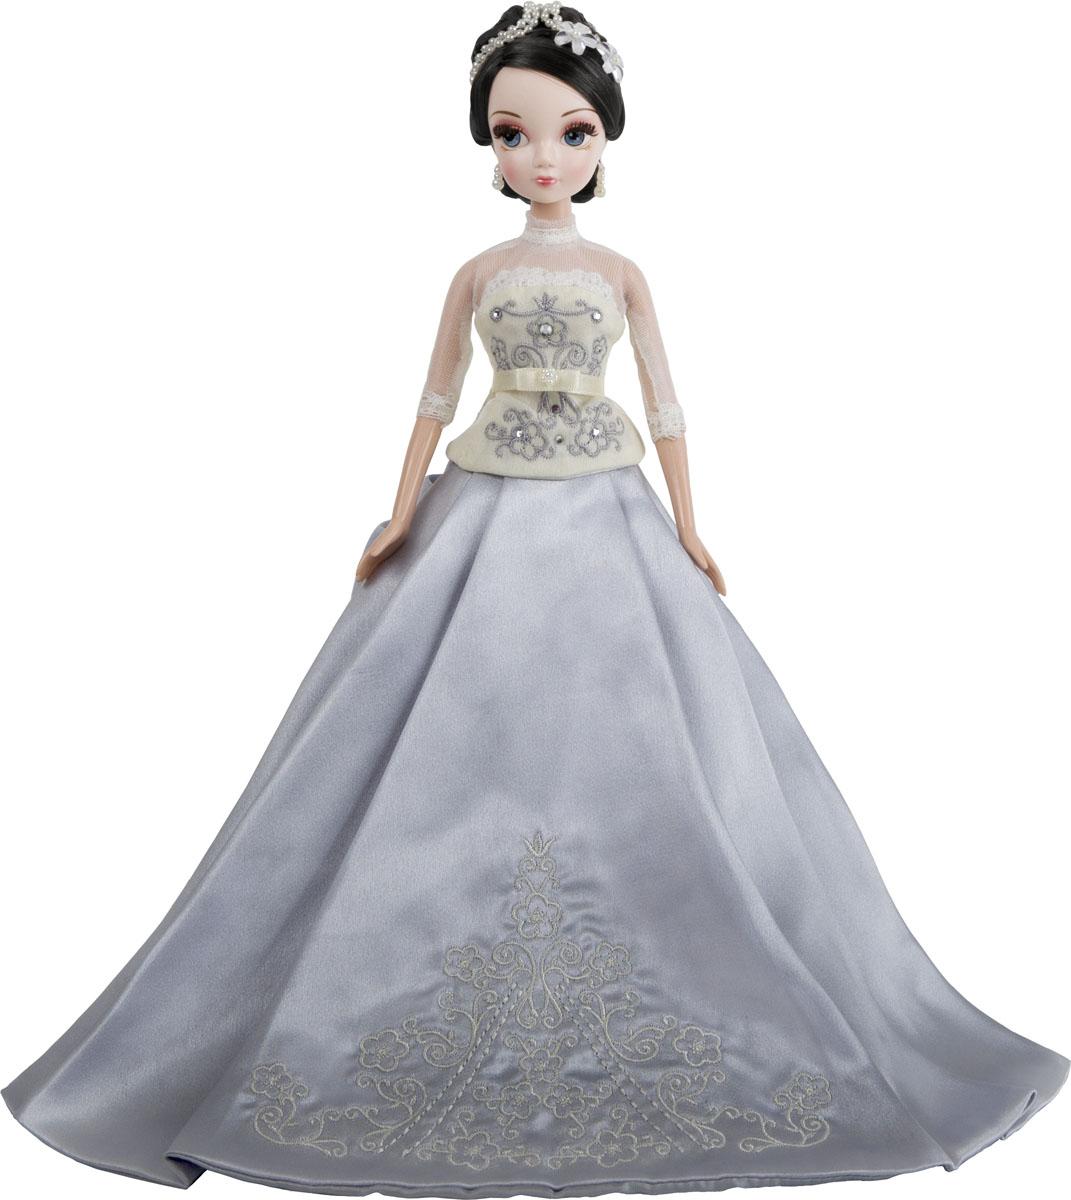 Sonya Rose Кукла Gold Collection Зимняя сказка